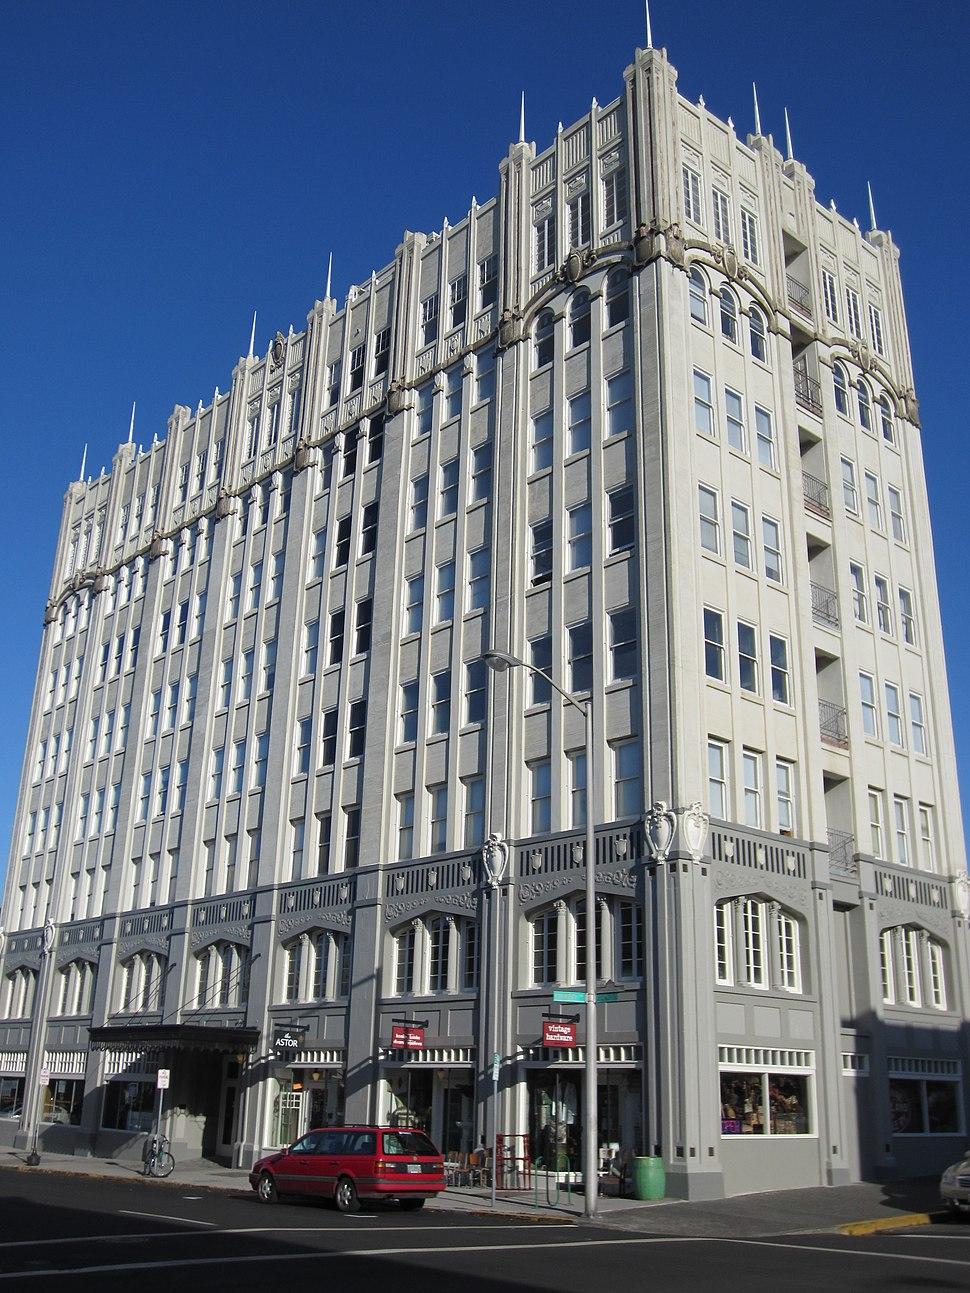 John Jacob Astor Hotel in Astoria